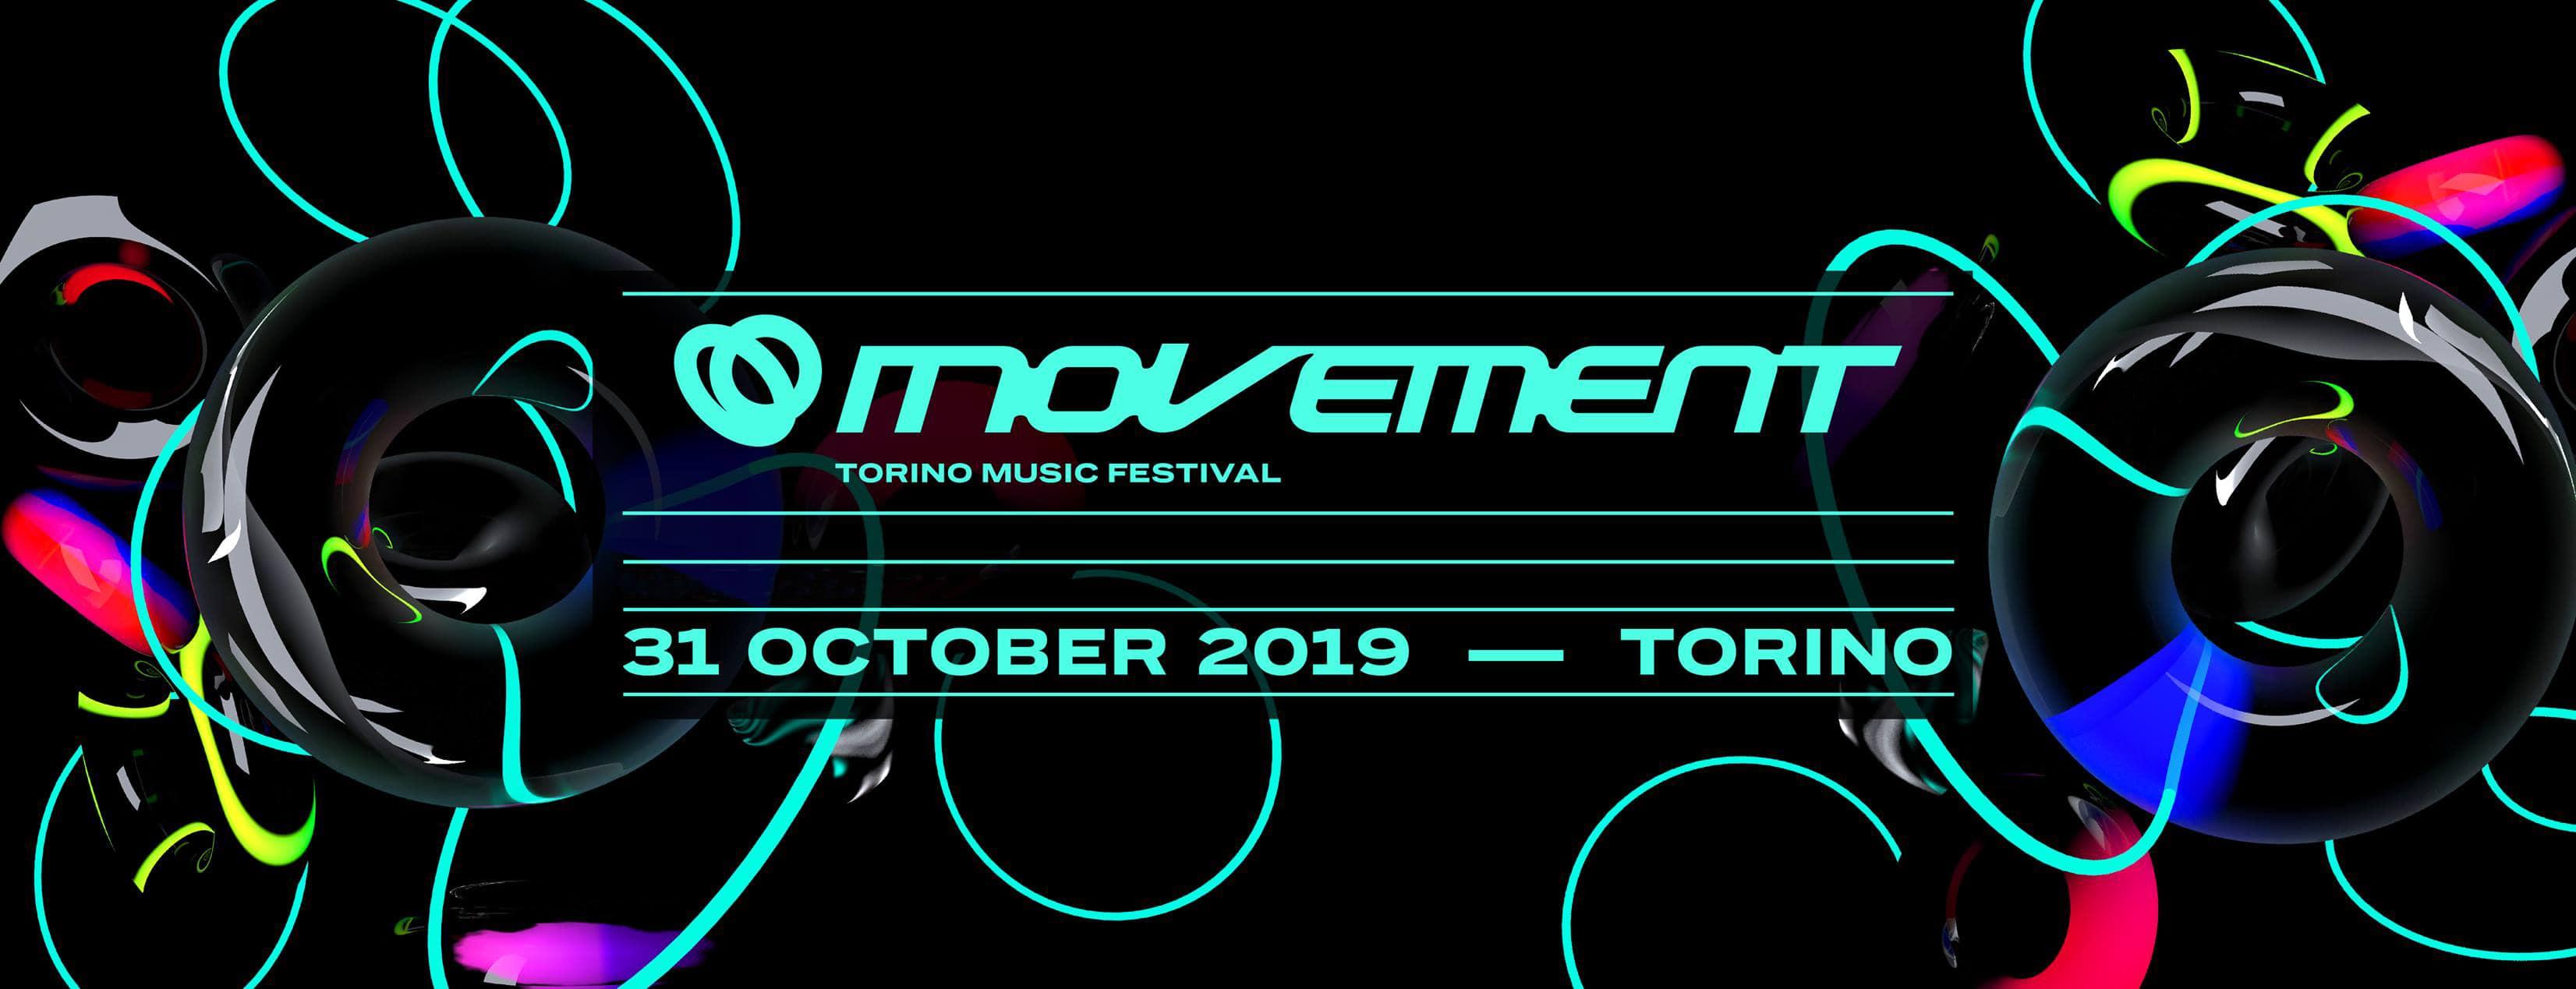 MOVEMENT Torino Music Festival – 31 Ottobre 2019 – Ticket e Pacchetti Hotel